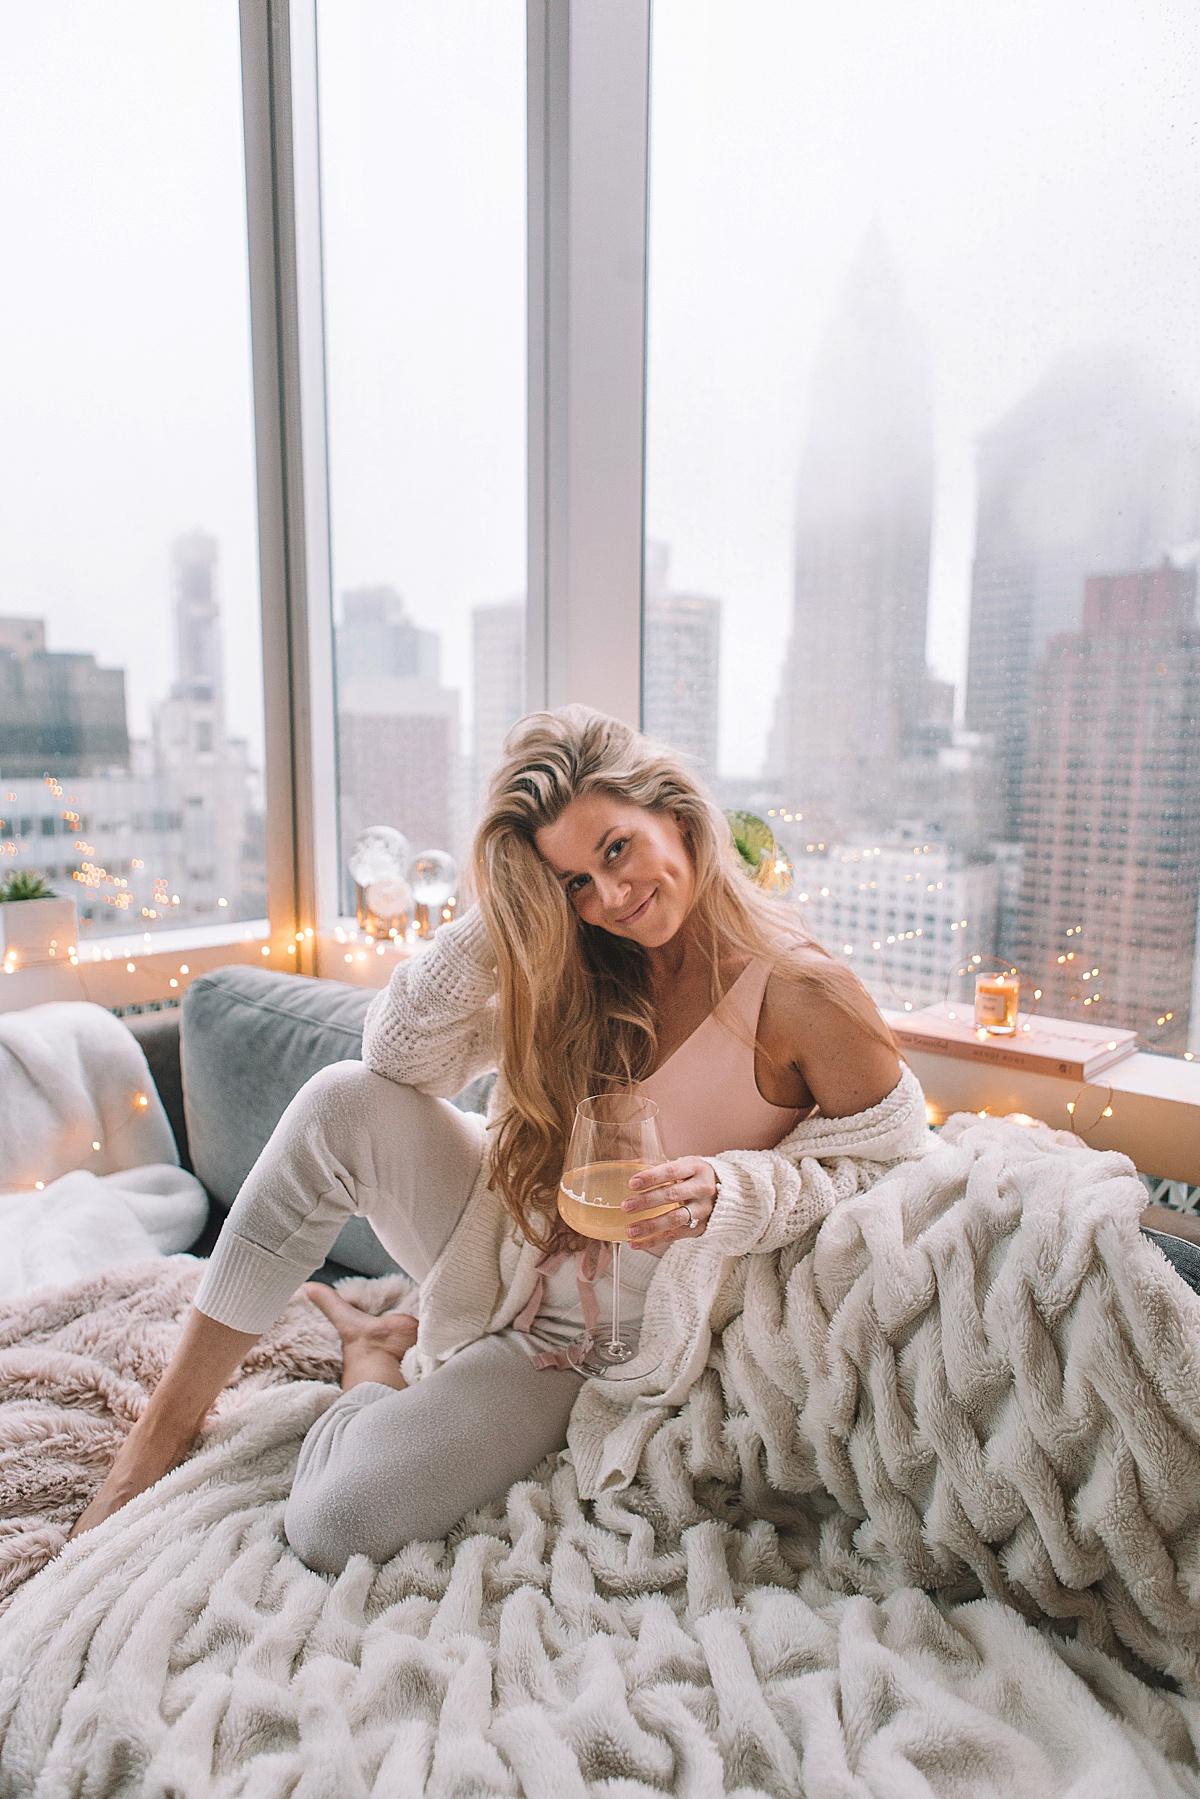 nyc apartment, social distancing, quarantine, self care blog, stay home, comfy clothes, west elm, olivia rink, olivia rink apartment, city apartment, apartment decor